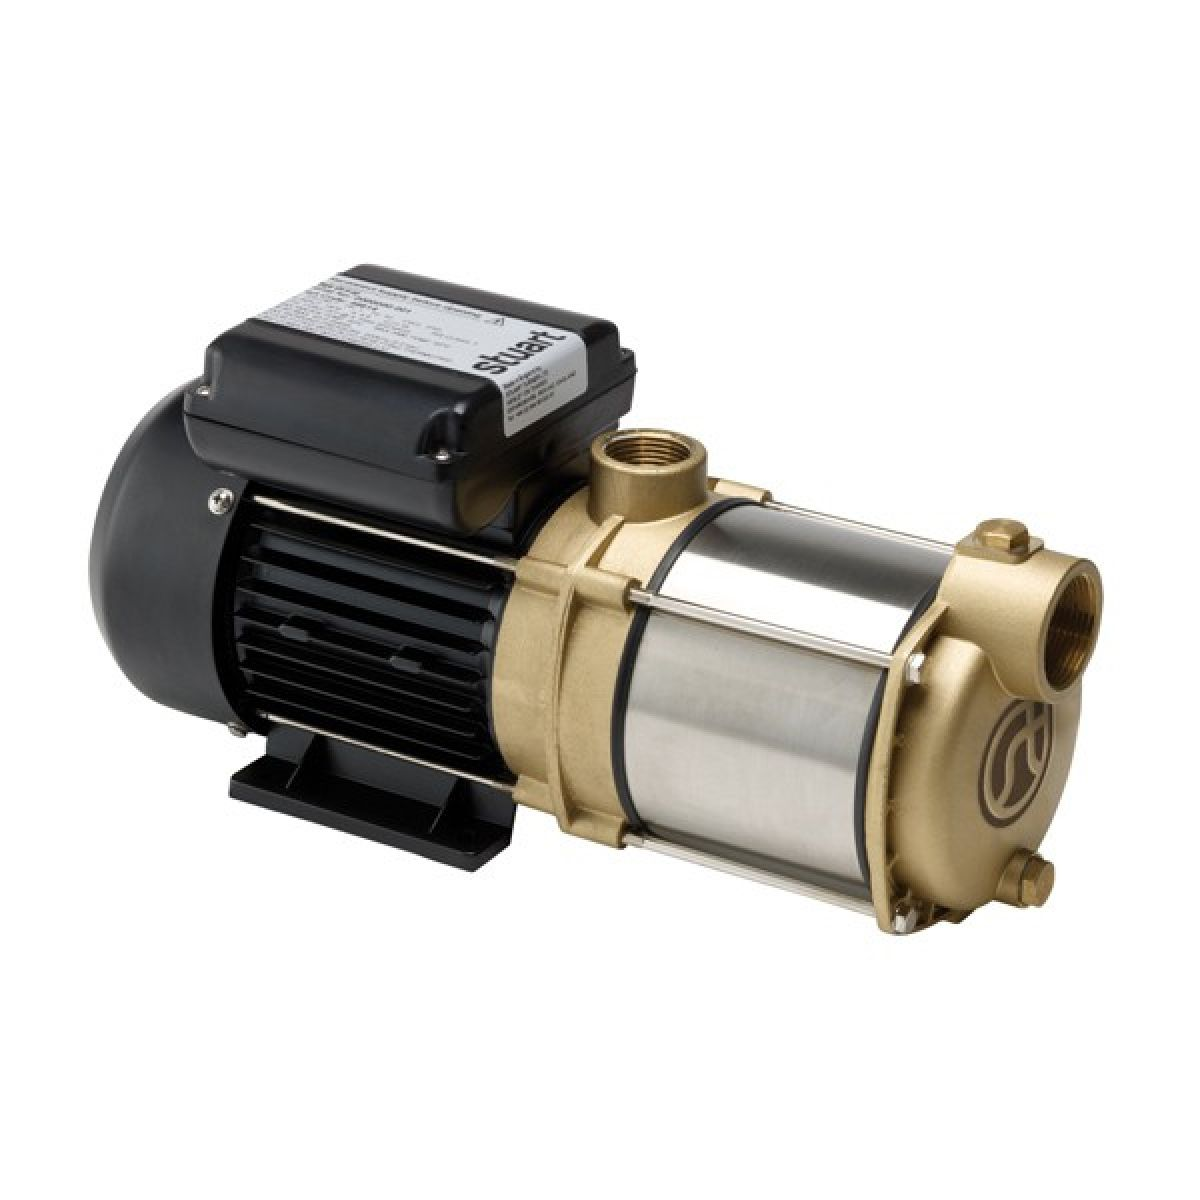 Stuart Turner 46555 CH 4-50 Centrifugal Multistage 5.0 Bar Pump